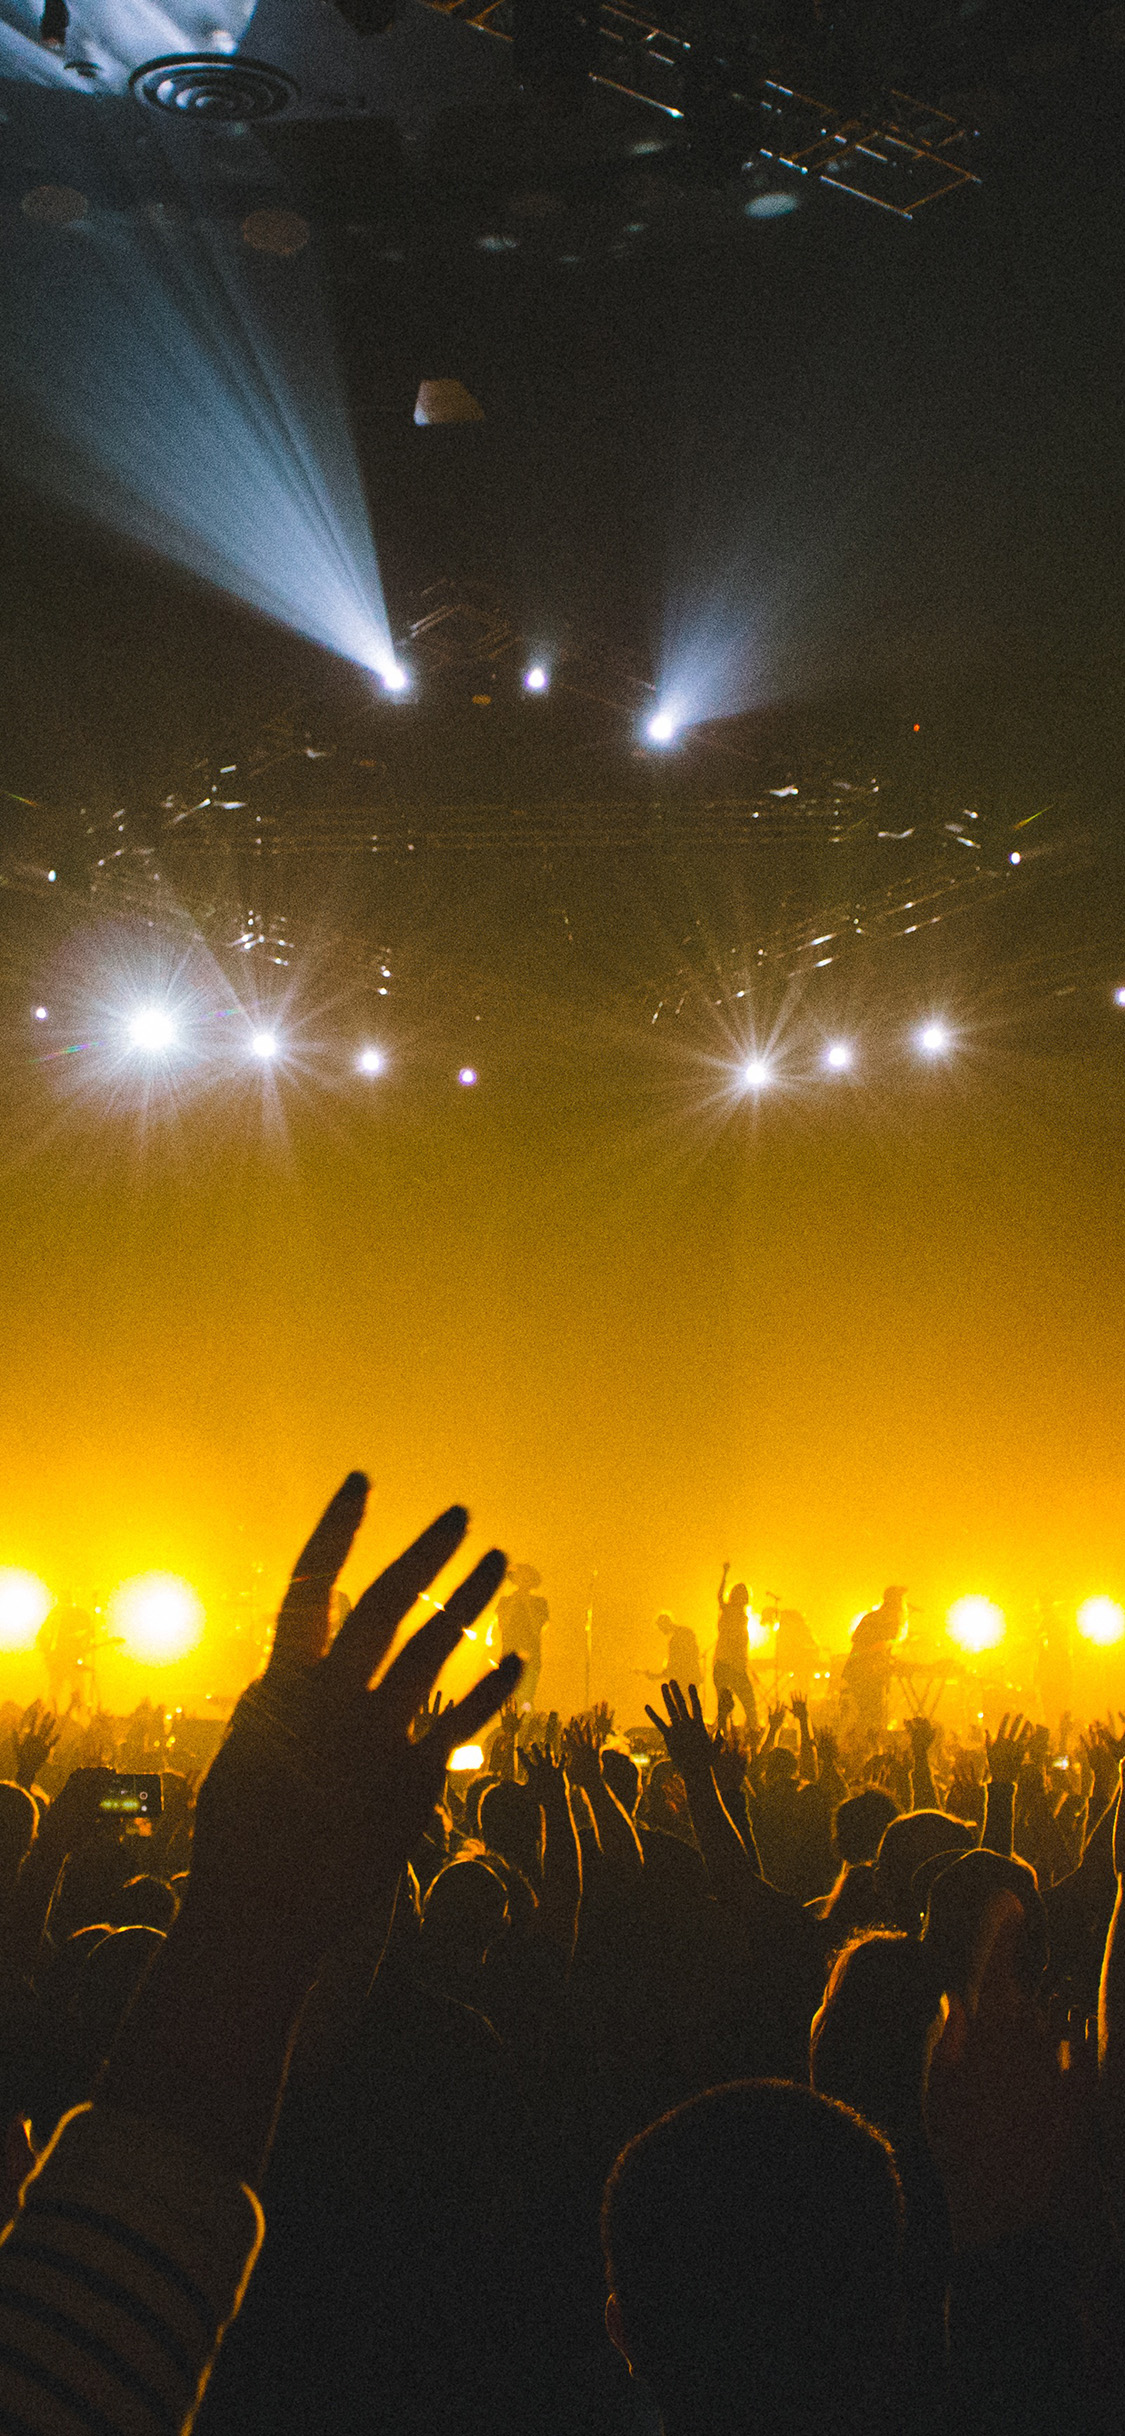 iPhonexpapers.com-Apple-iPhone-wallpaper-oa54-concert-music-artist-rock-night-nature-city